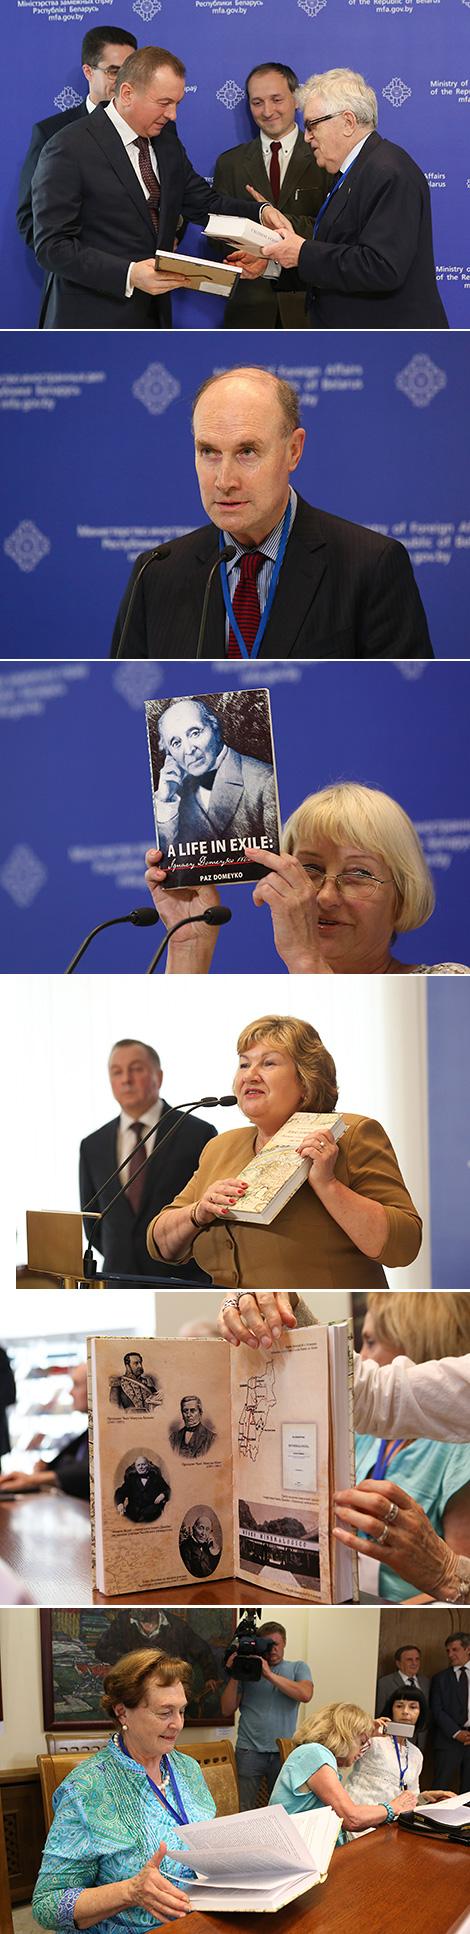 Belarus' MFA hosts event to mark 215th birthday of scientist Ignacy Domeyko